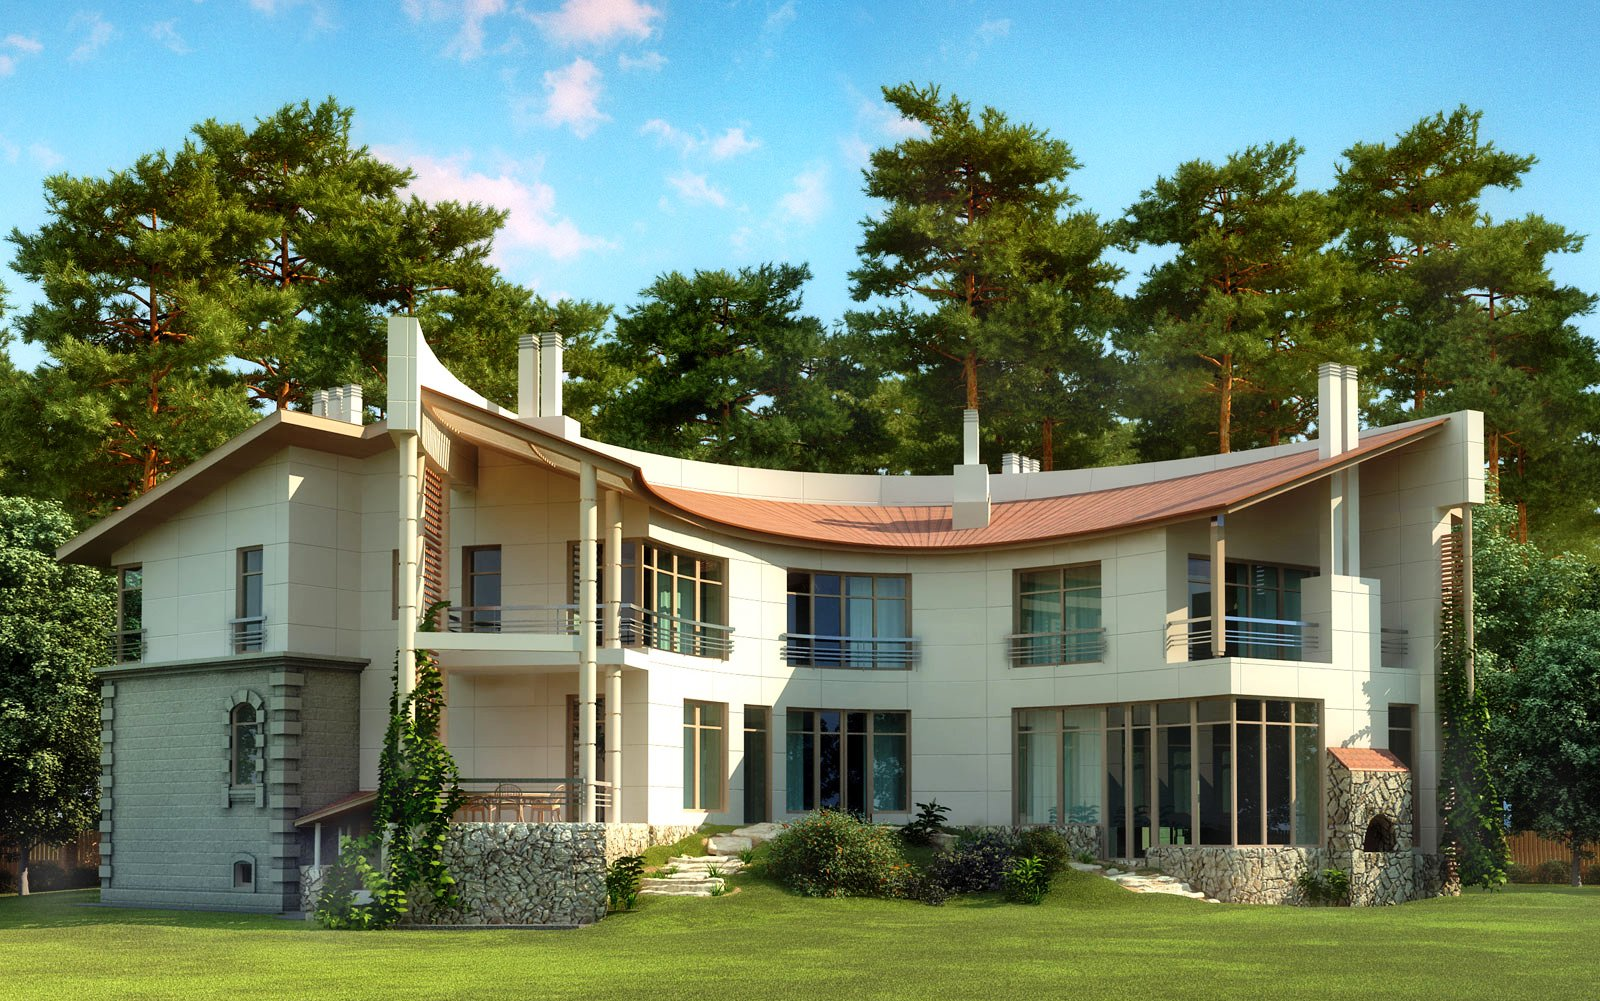 Casatreschic Interior America 39 S Best House Plans House